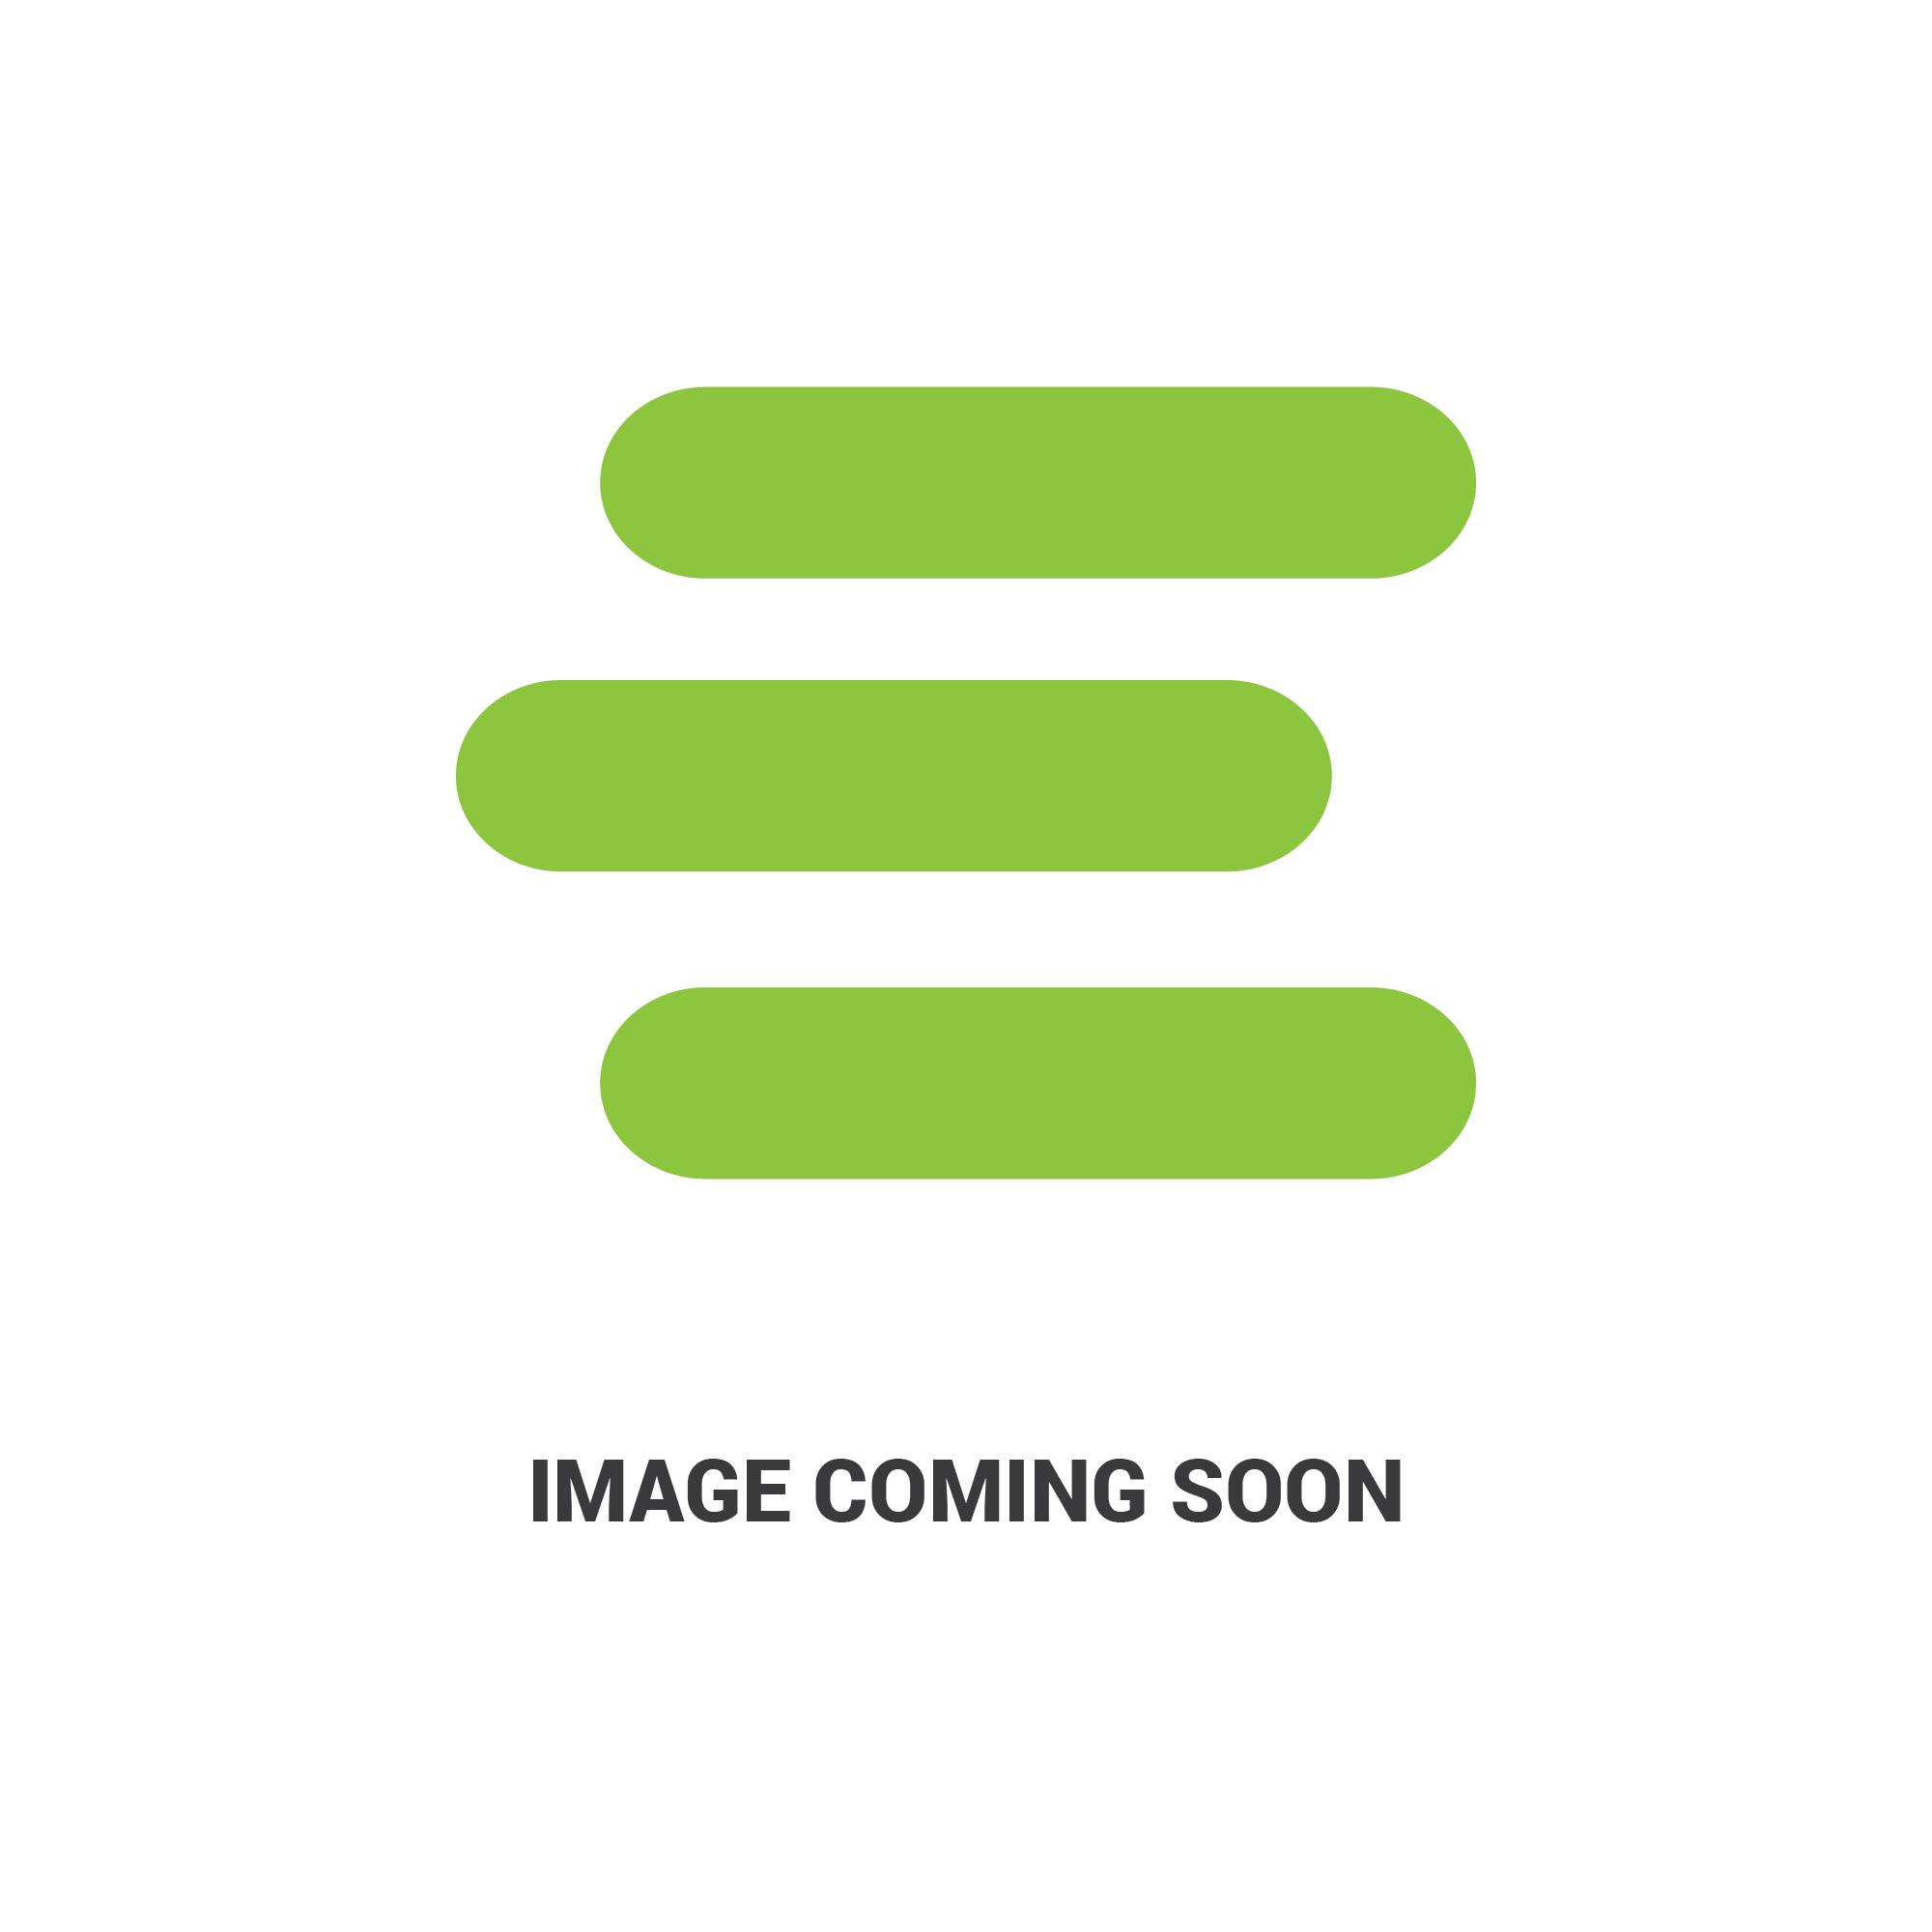 E-59800-26110edit 2.jpg